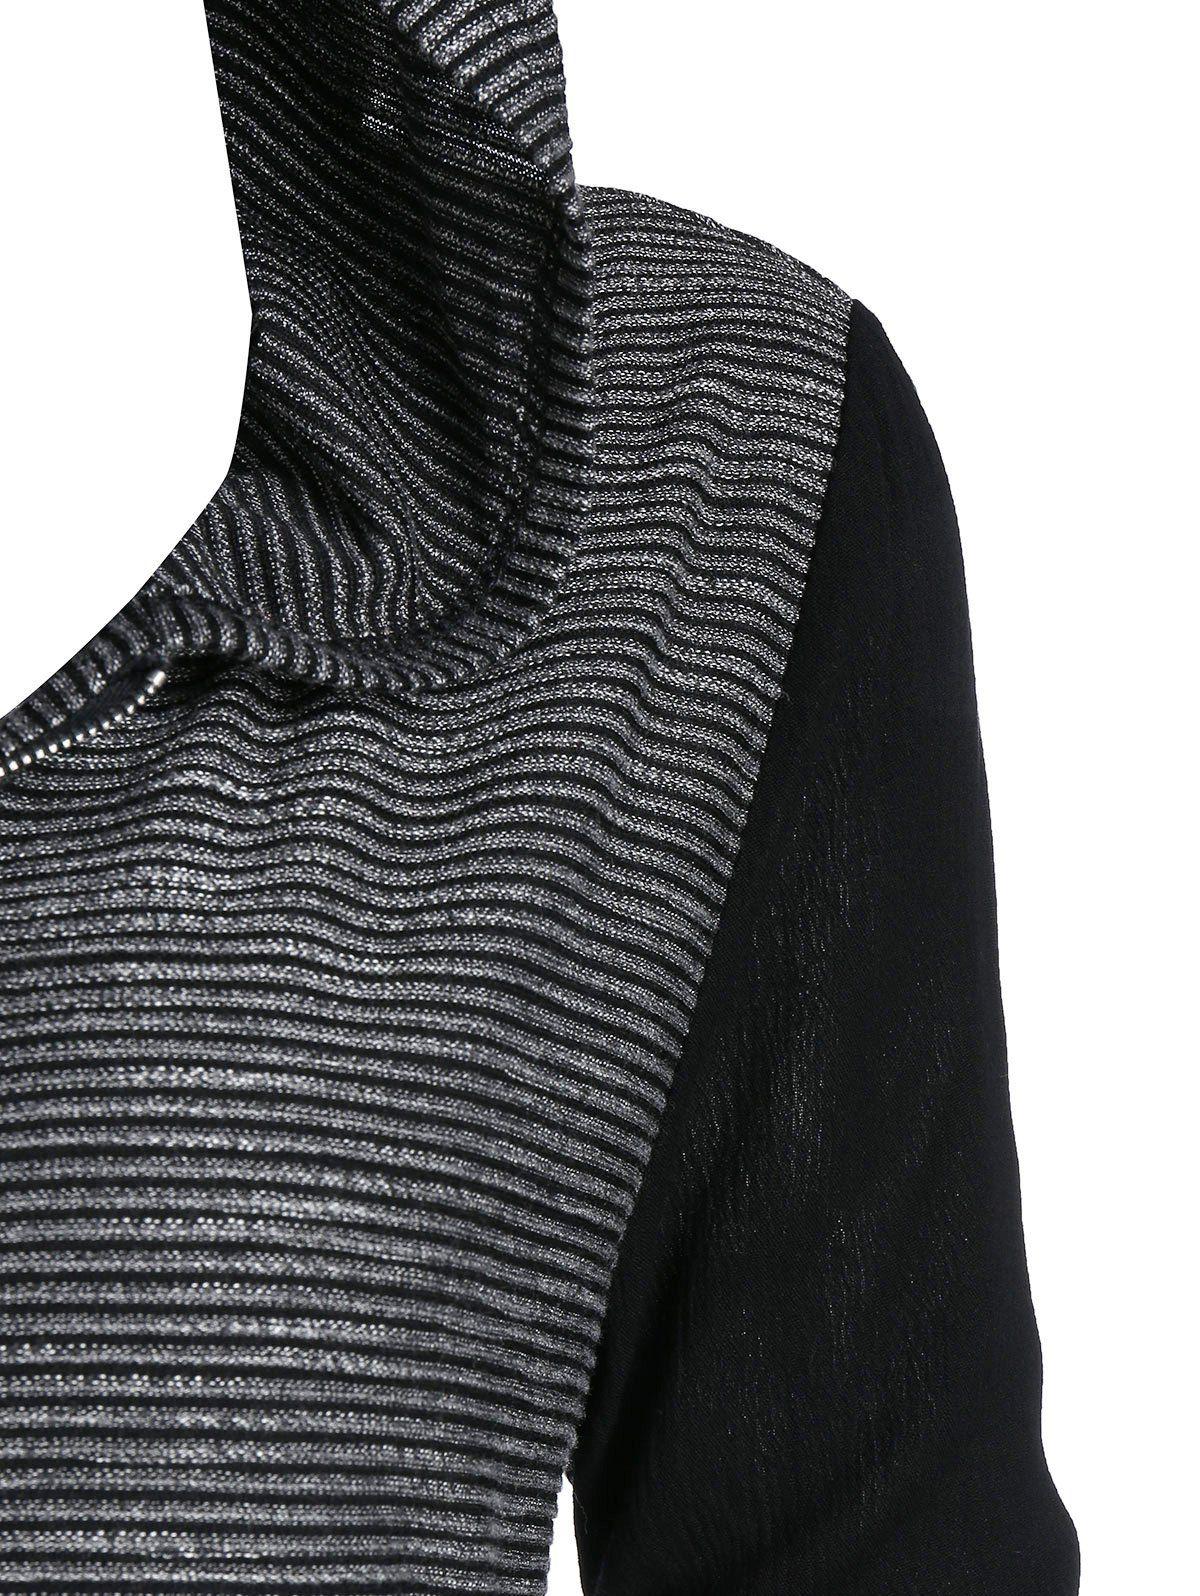 Colmkley Mens Sweater Casual Winter Sweatshirt Zip-up Warm Outwear Jacket Coat